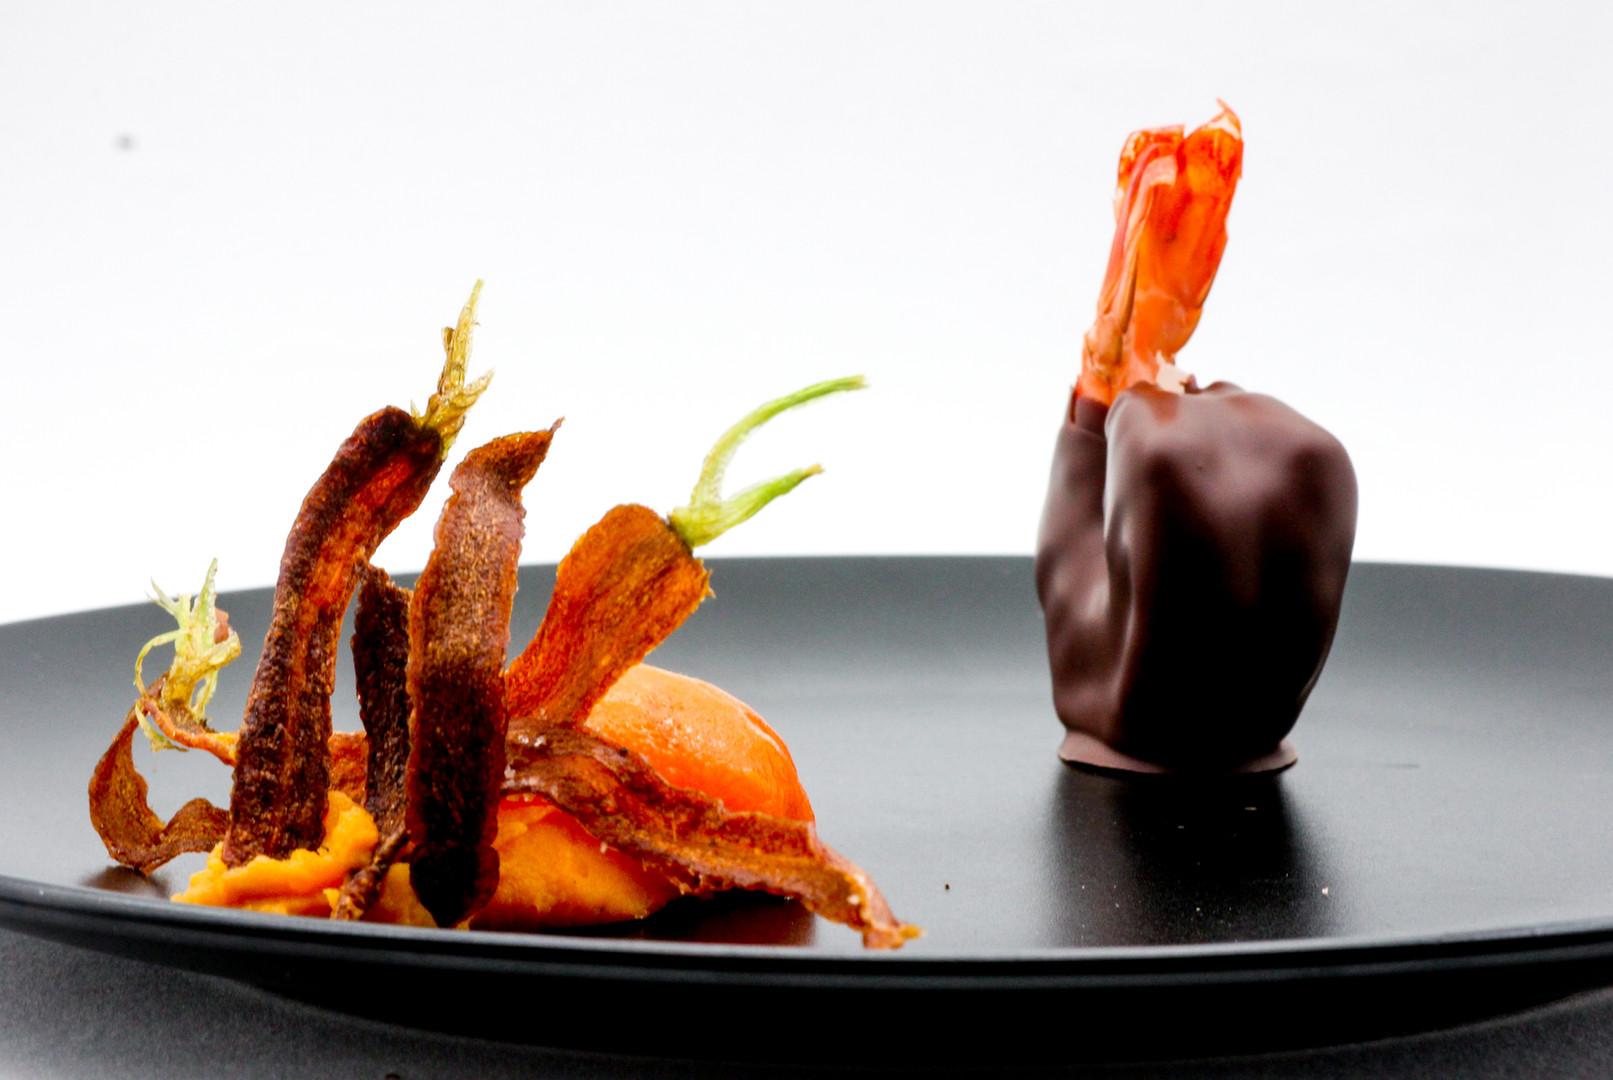 Chef Eyal Liebman's Food Creations